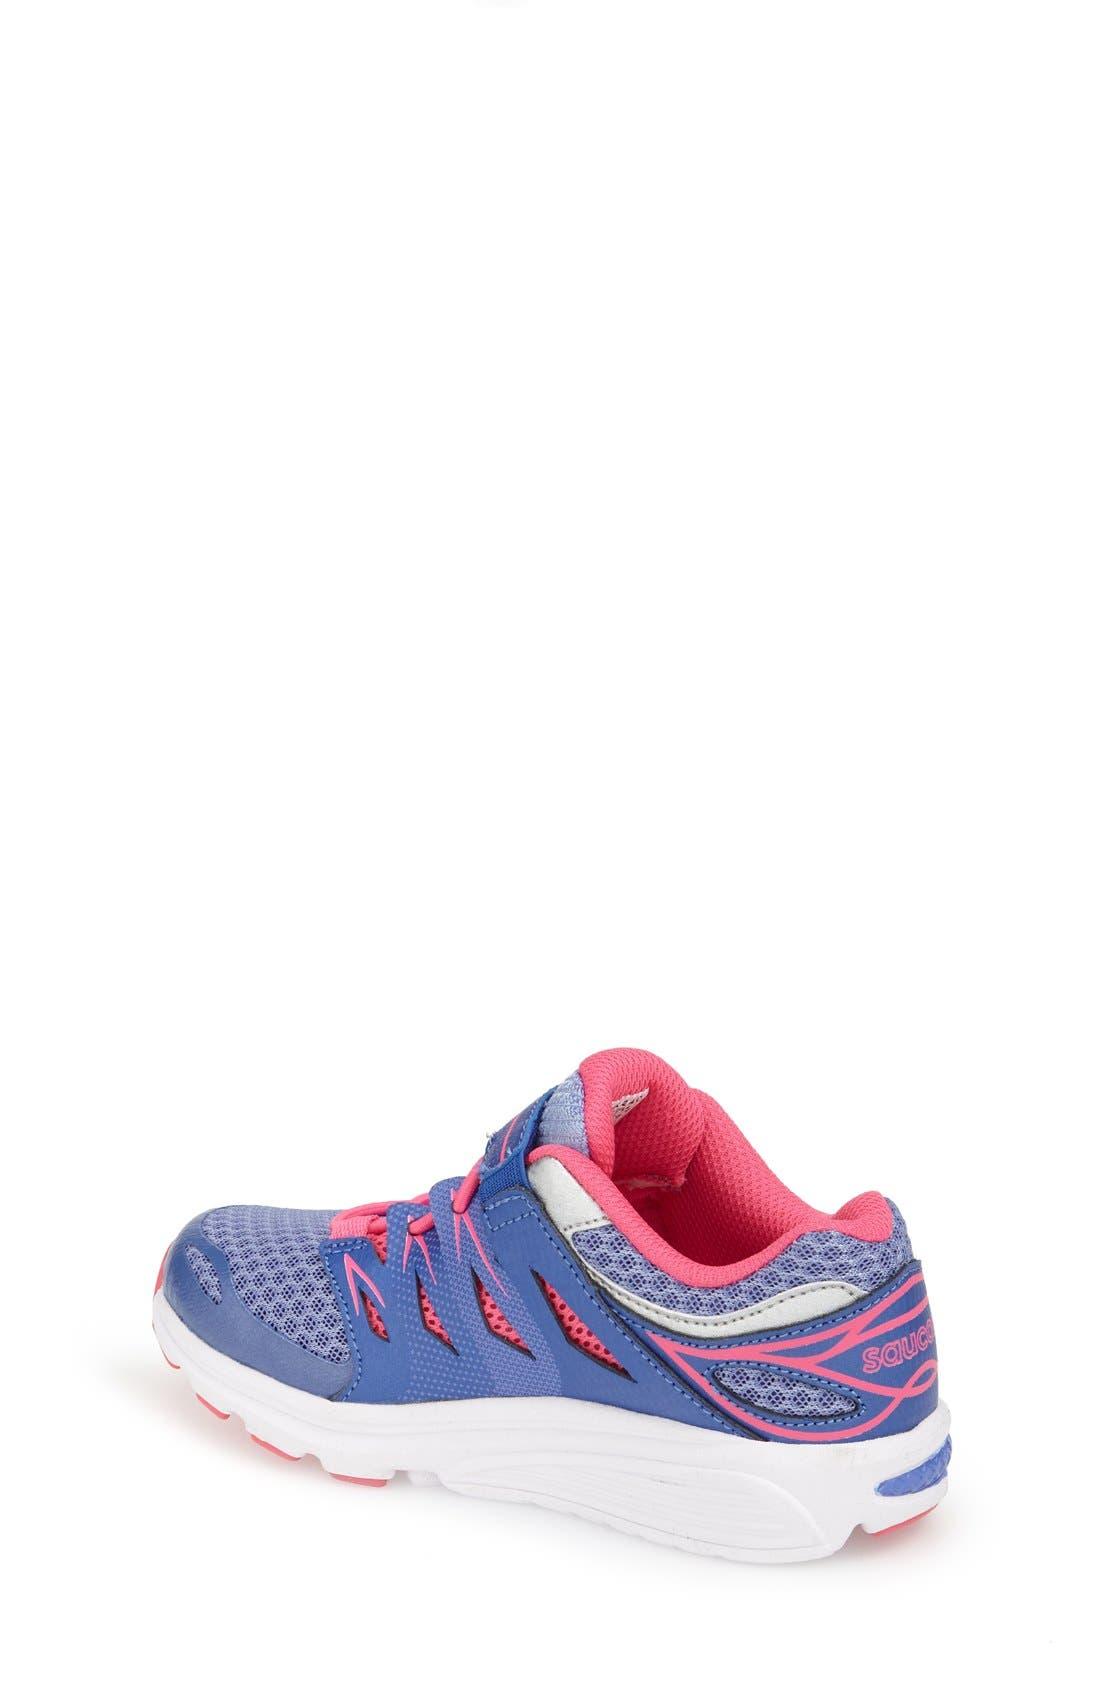 Alternate Image 2  - Saucony 'Zealot 2 AC' Sneaker (Toddler & Little Kid)